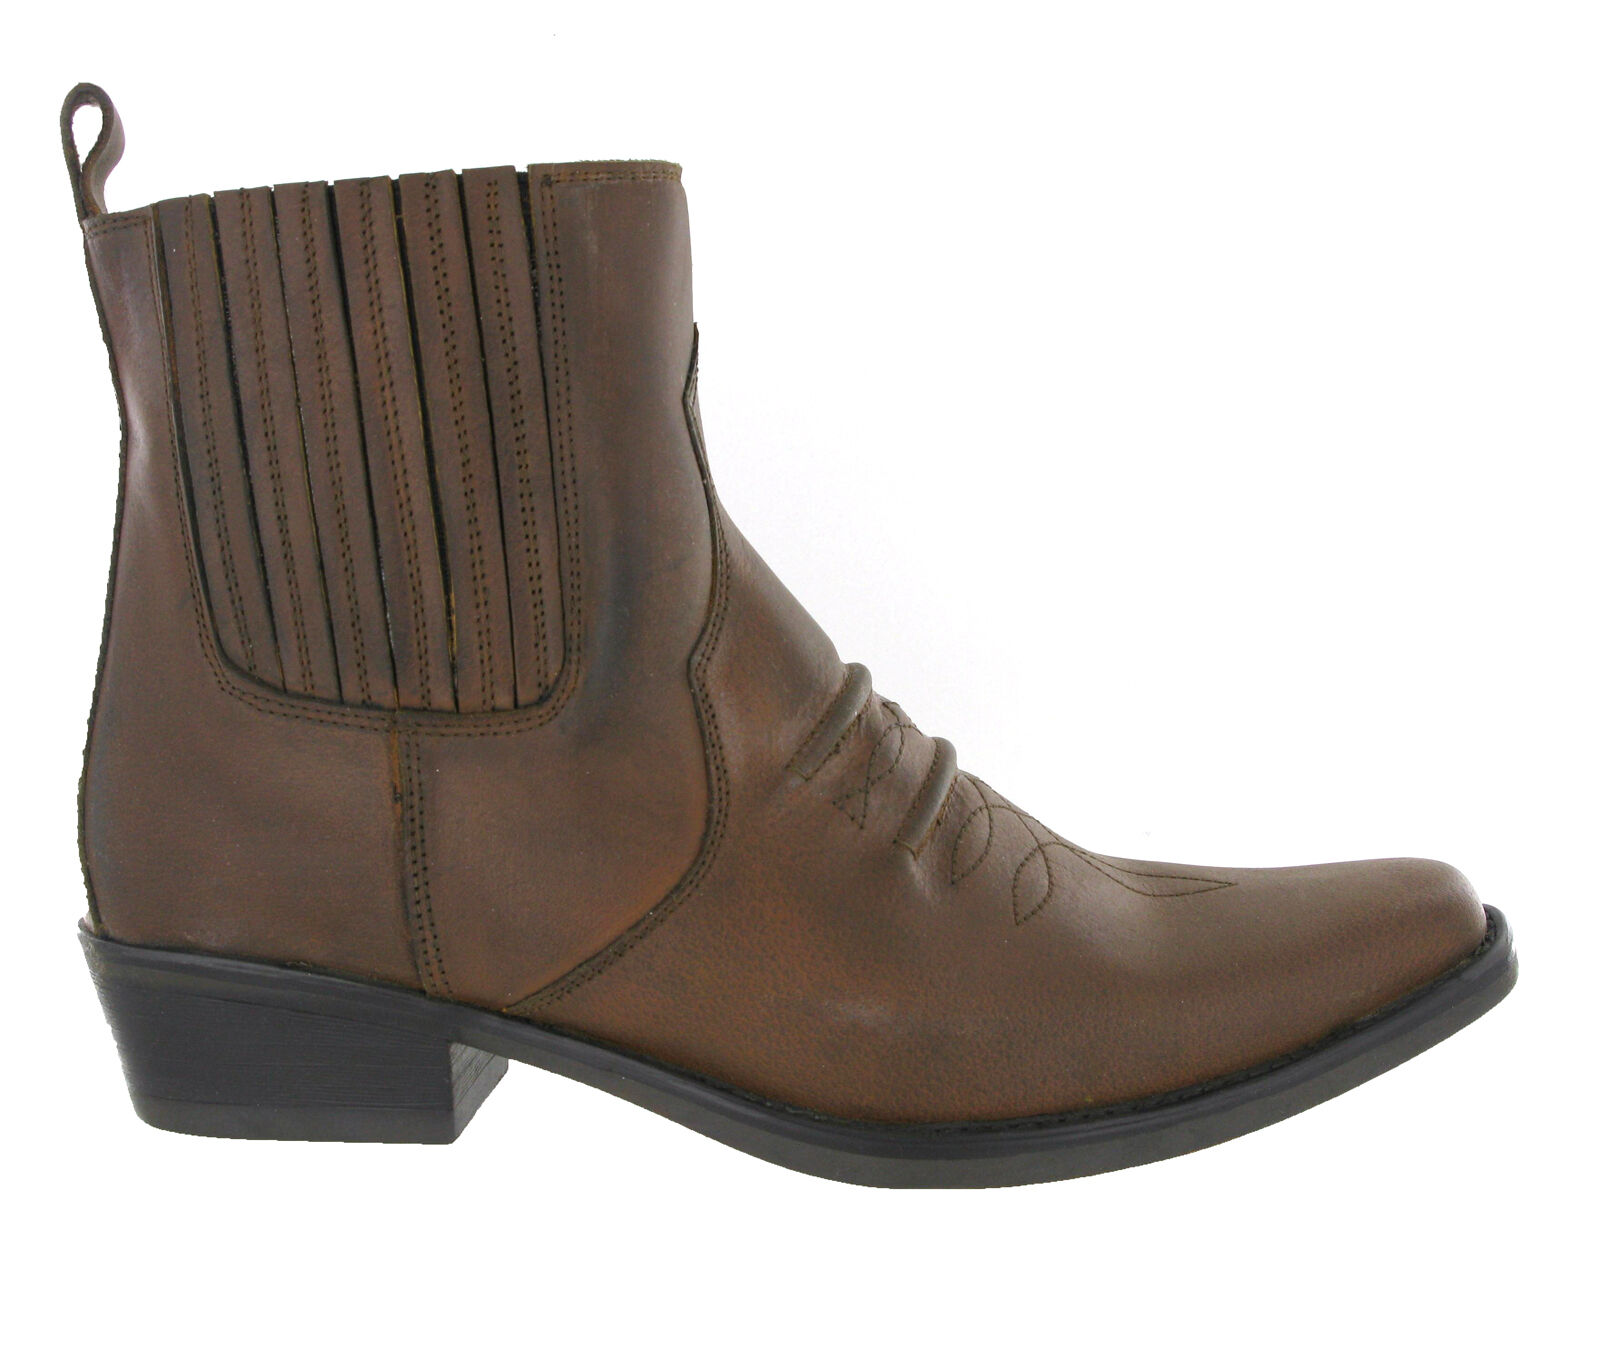 "Leather Toe Round 11"" Ed Limited Uomo Lucchese Western"